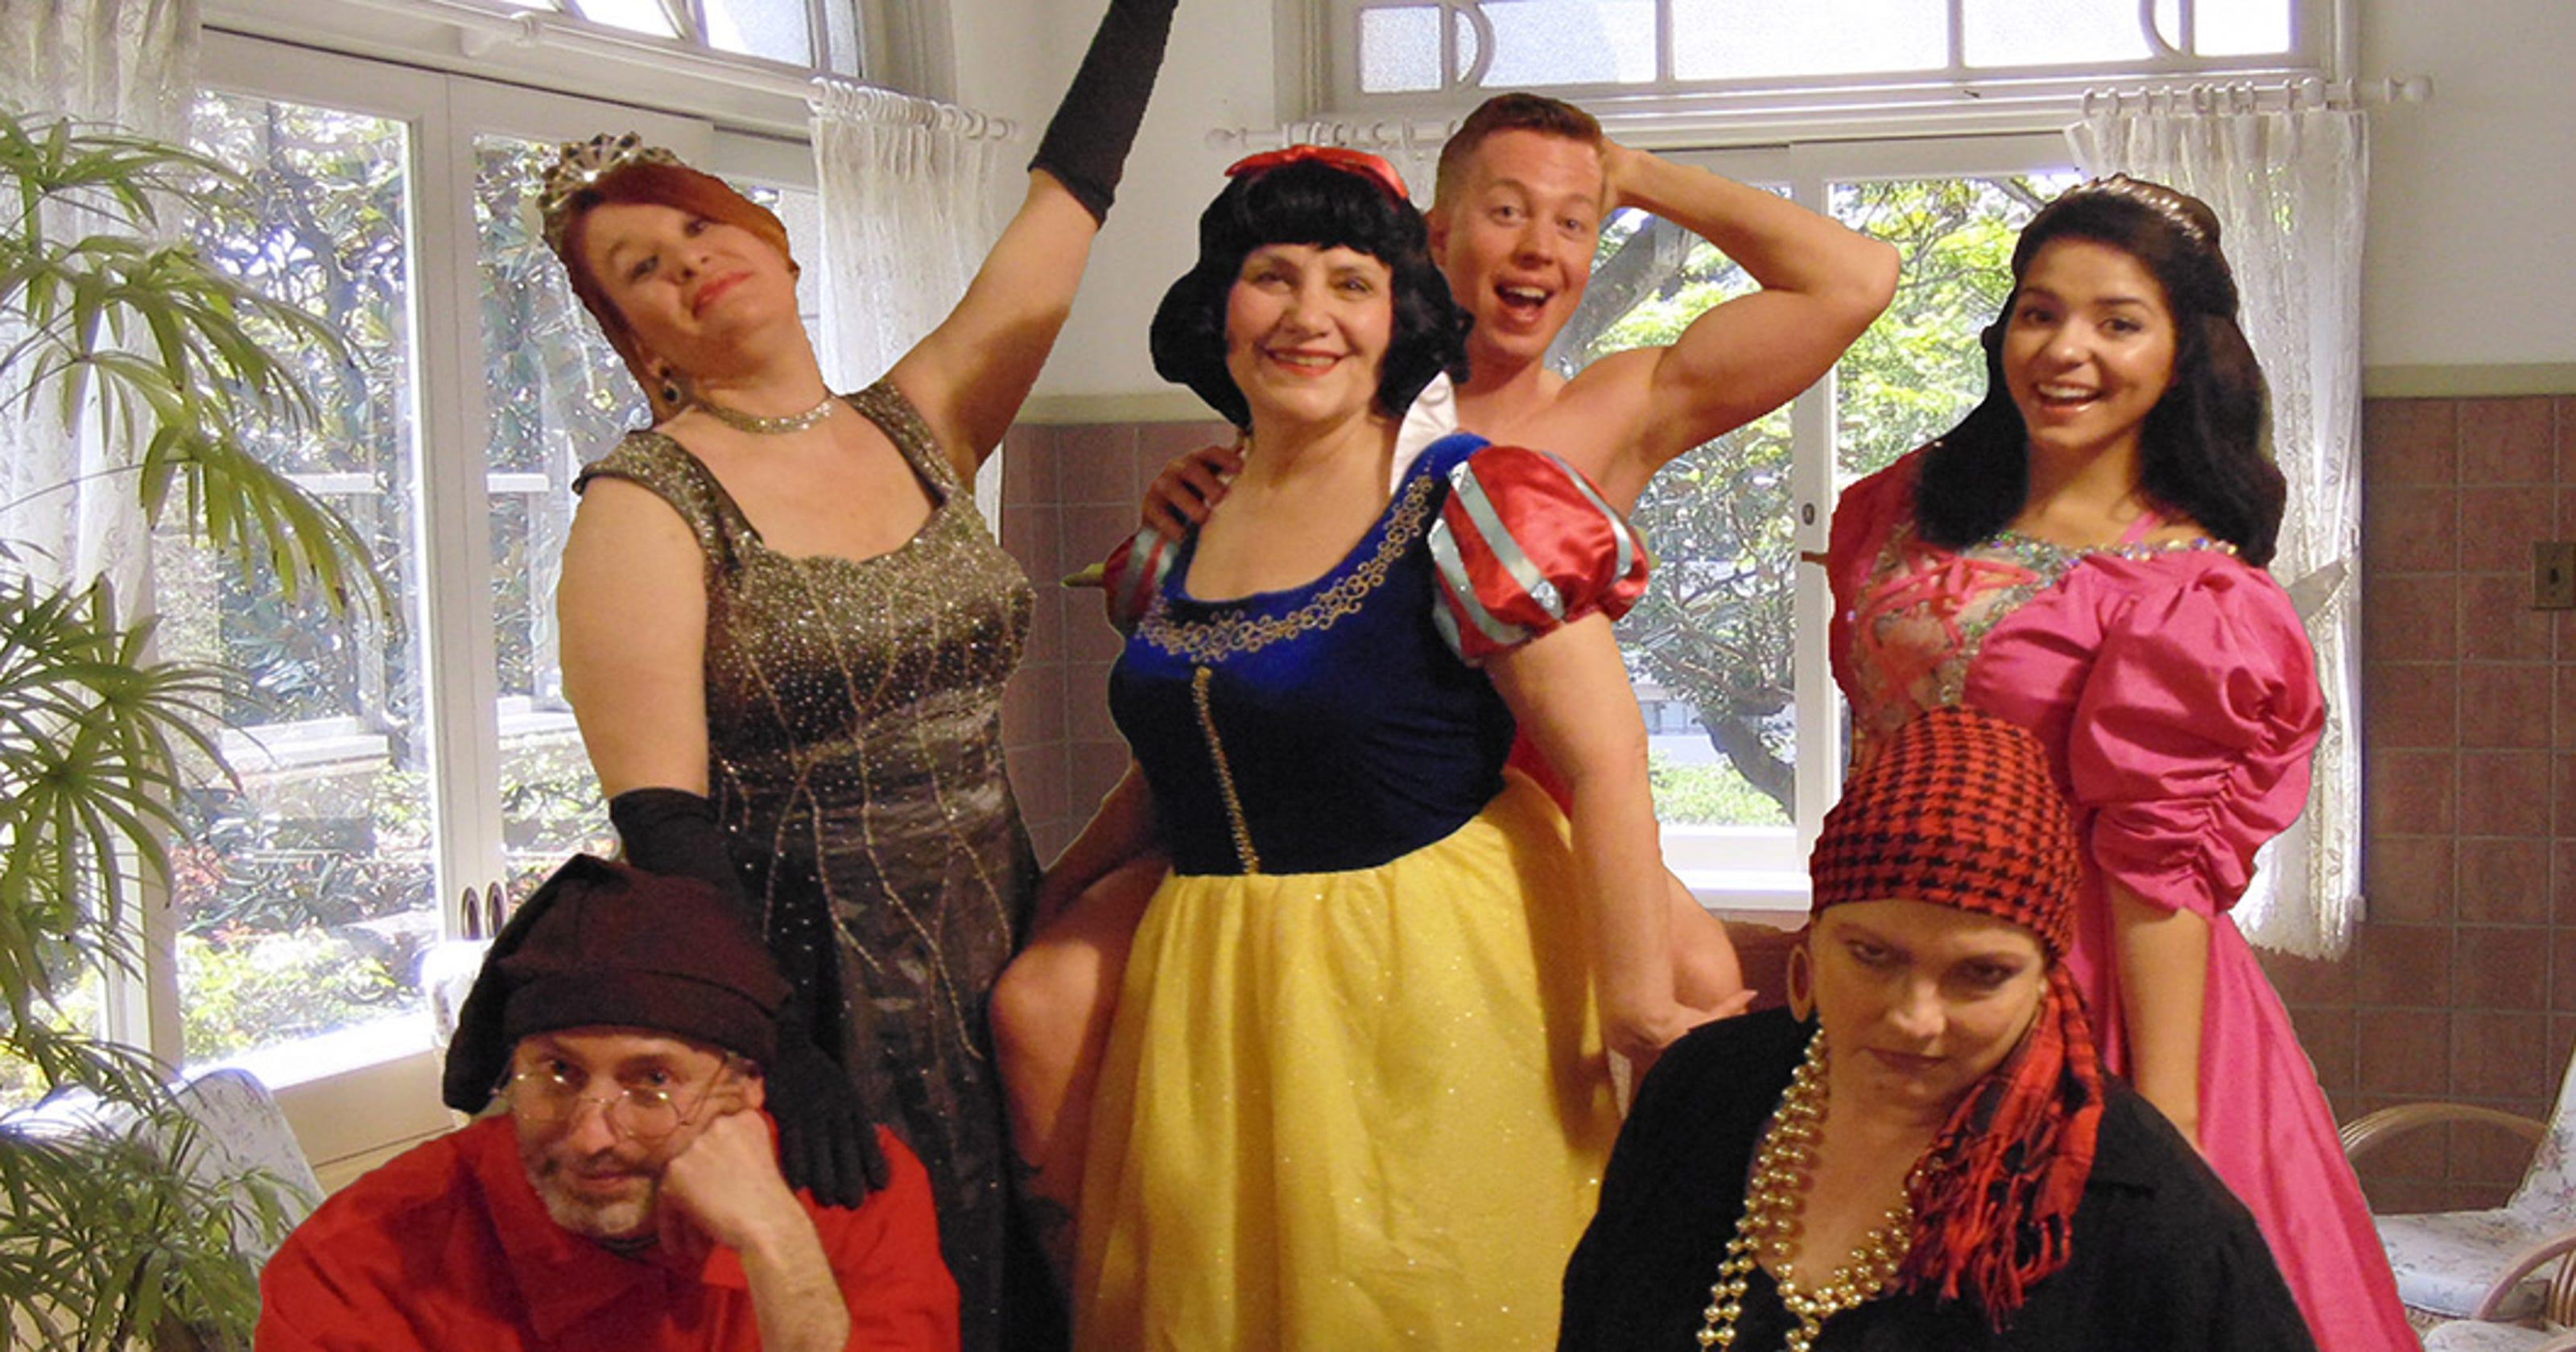 ELT's 'Vanya and Sonia' puts fun into dysfunction